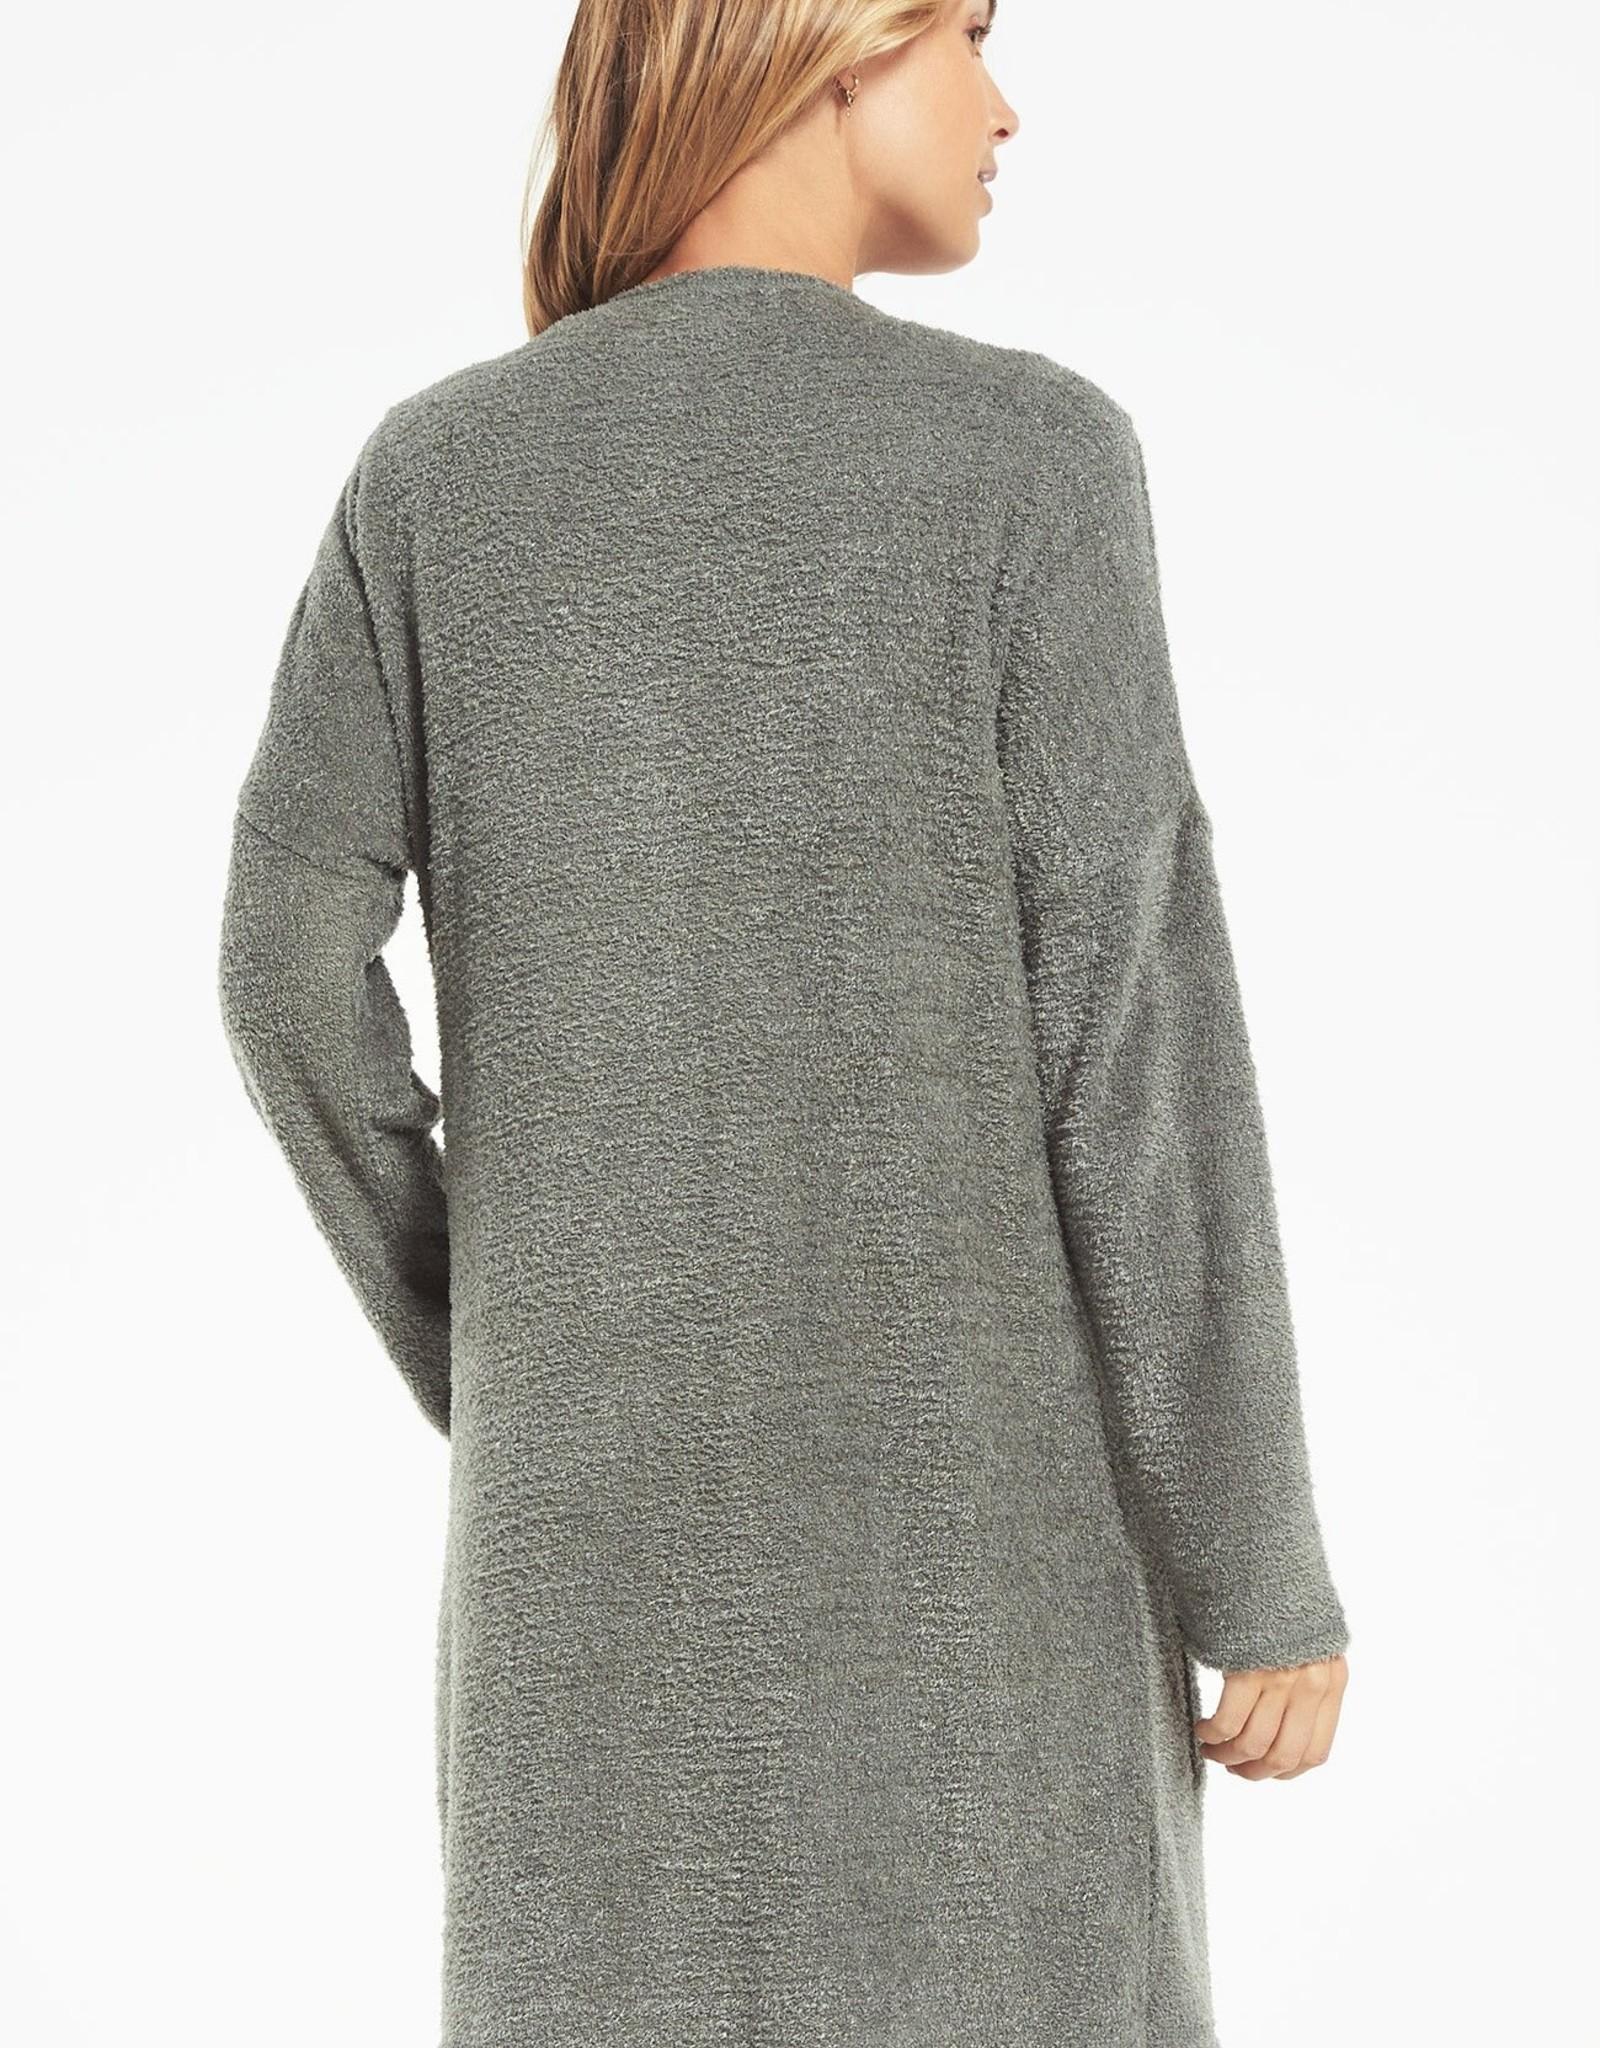 Z Supply Remi Feather Knit Cardi